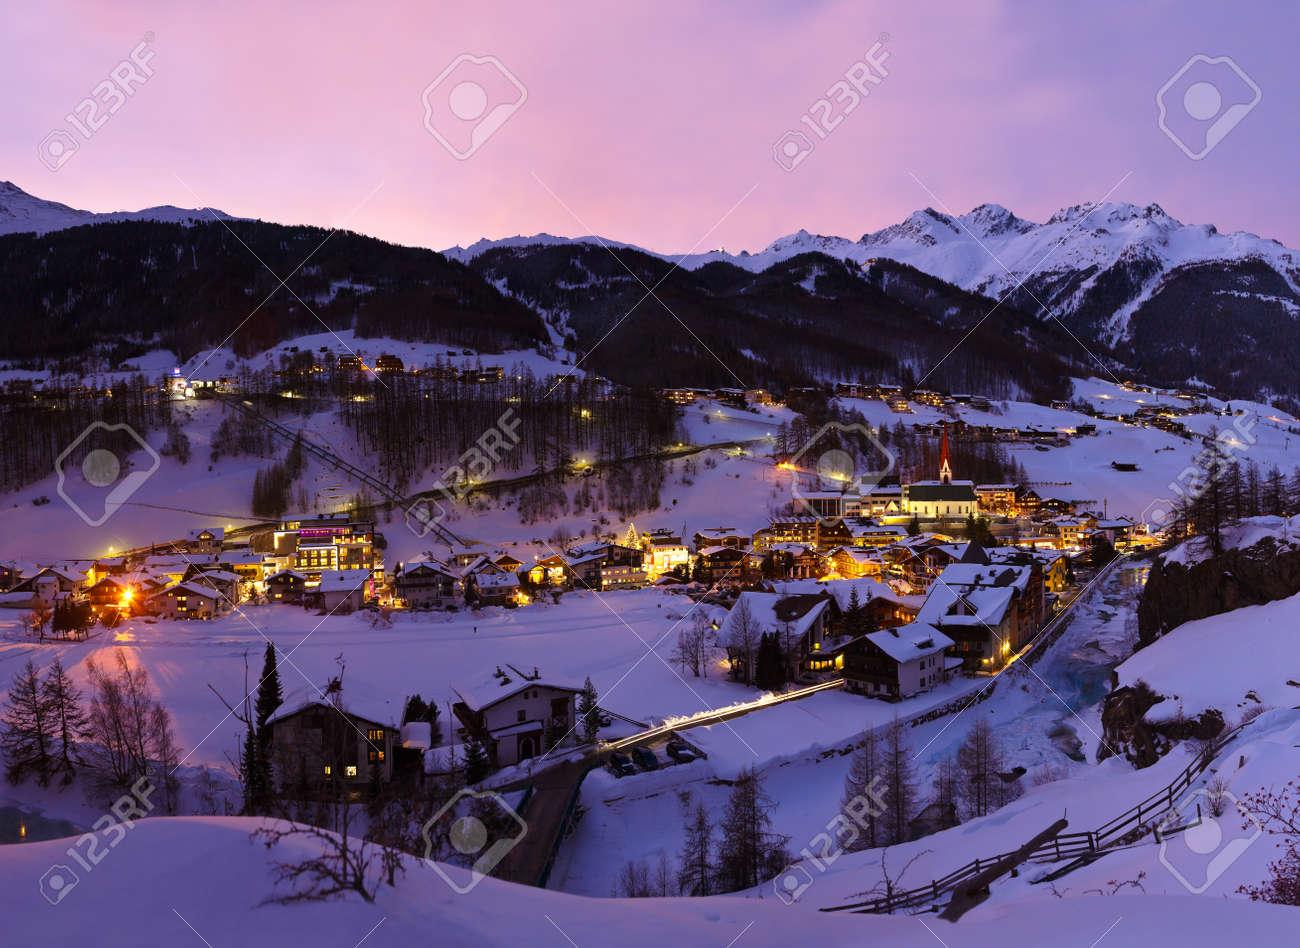 Mountains ski resort Solden Austria - nature and architecture background Stock Photo - 15726224